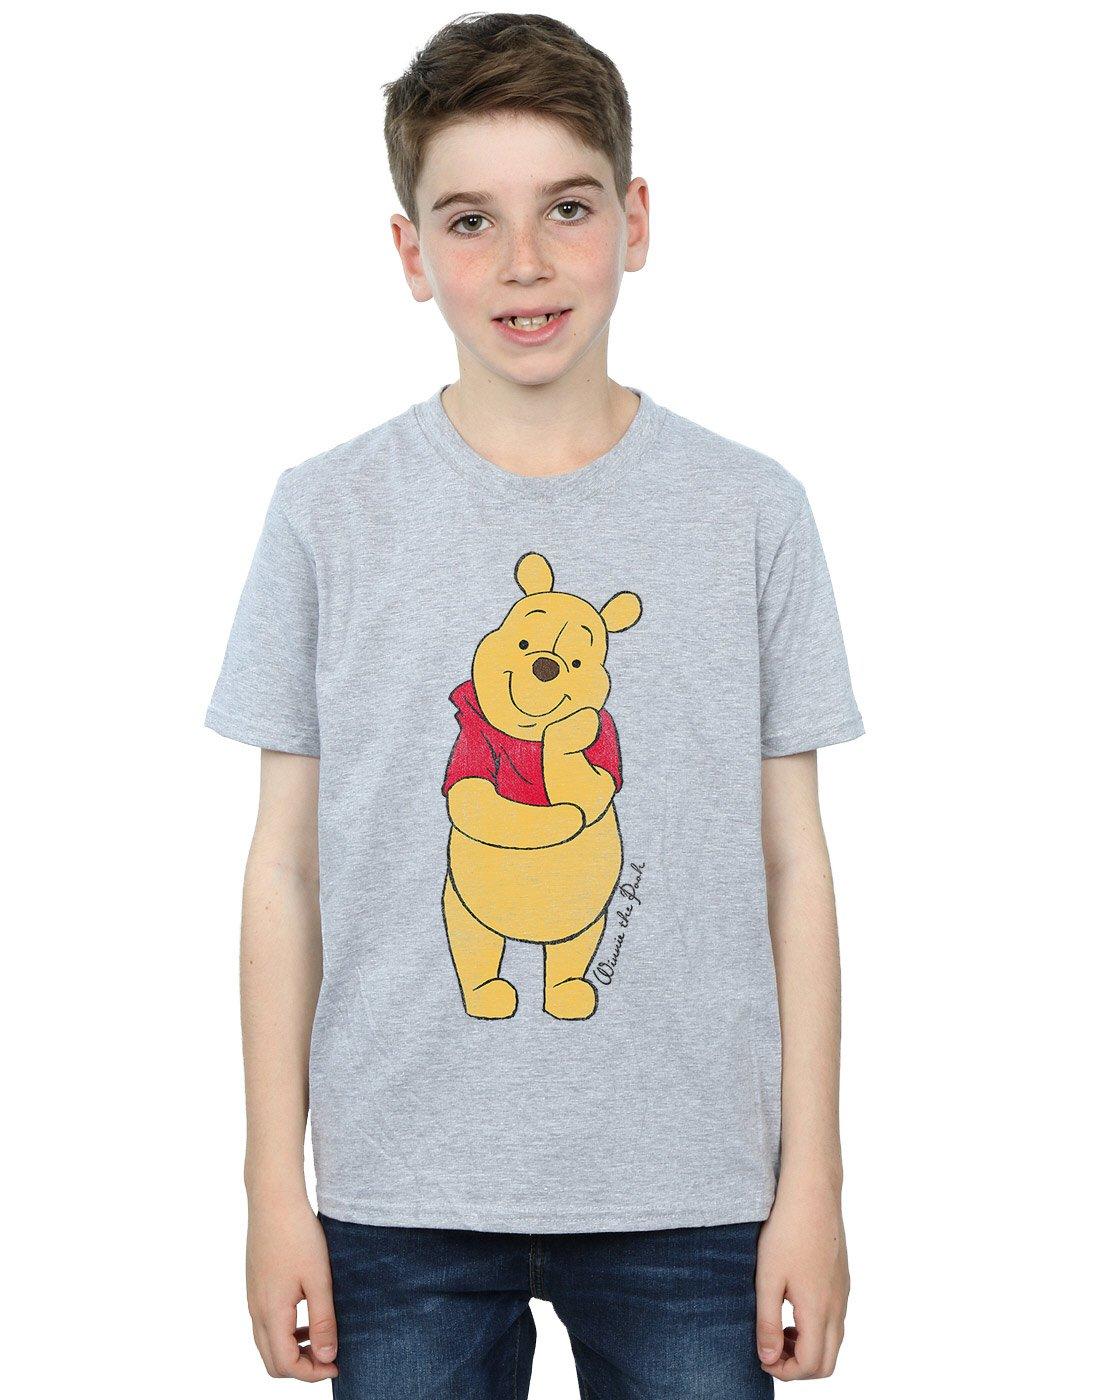 Winnie The Pooh Classic Pooh 2092 Shirts